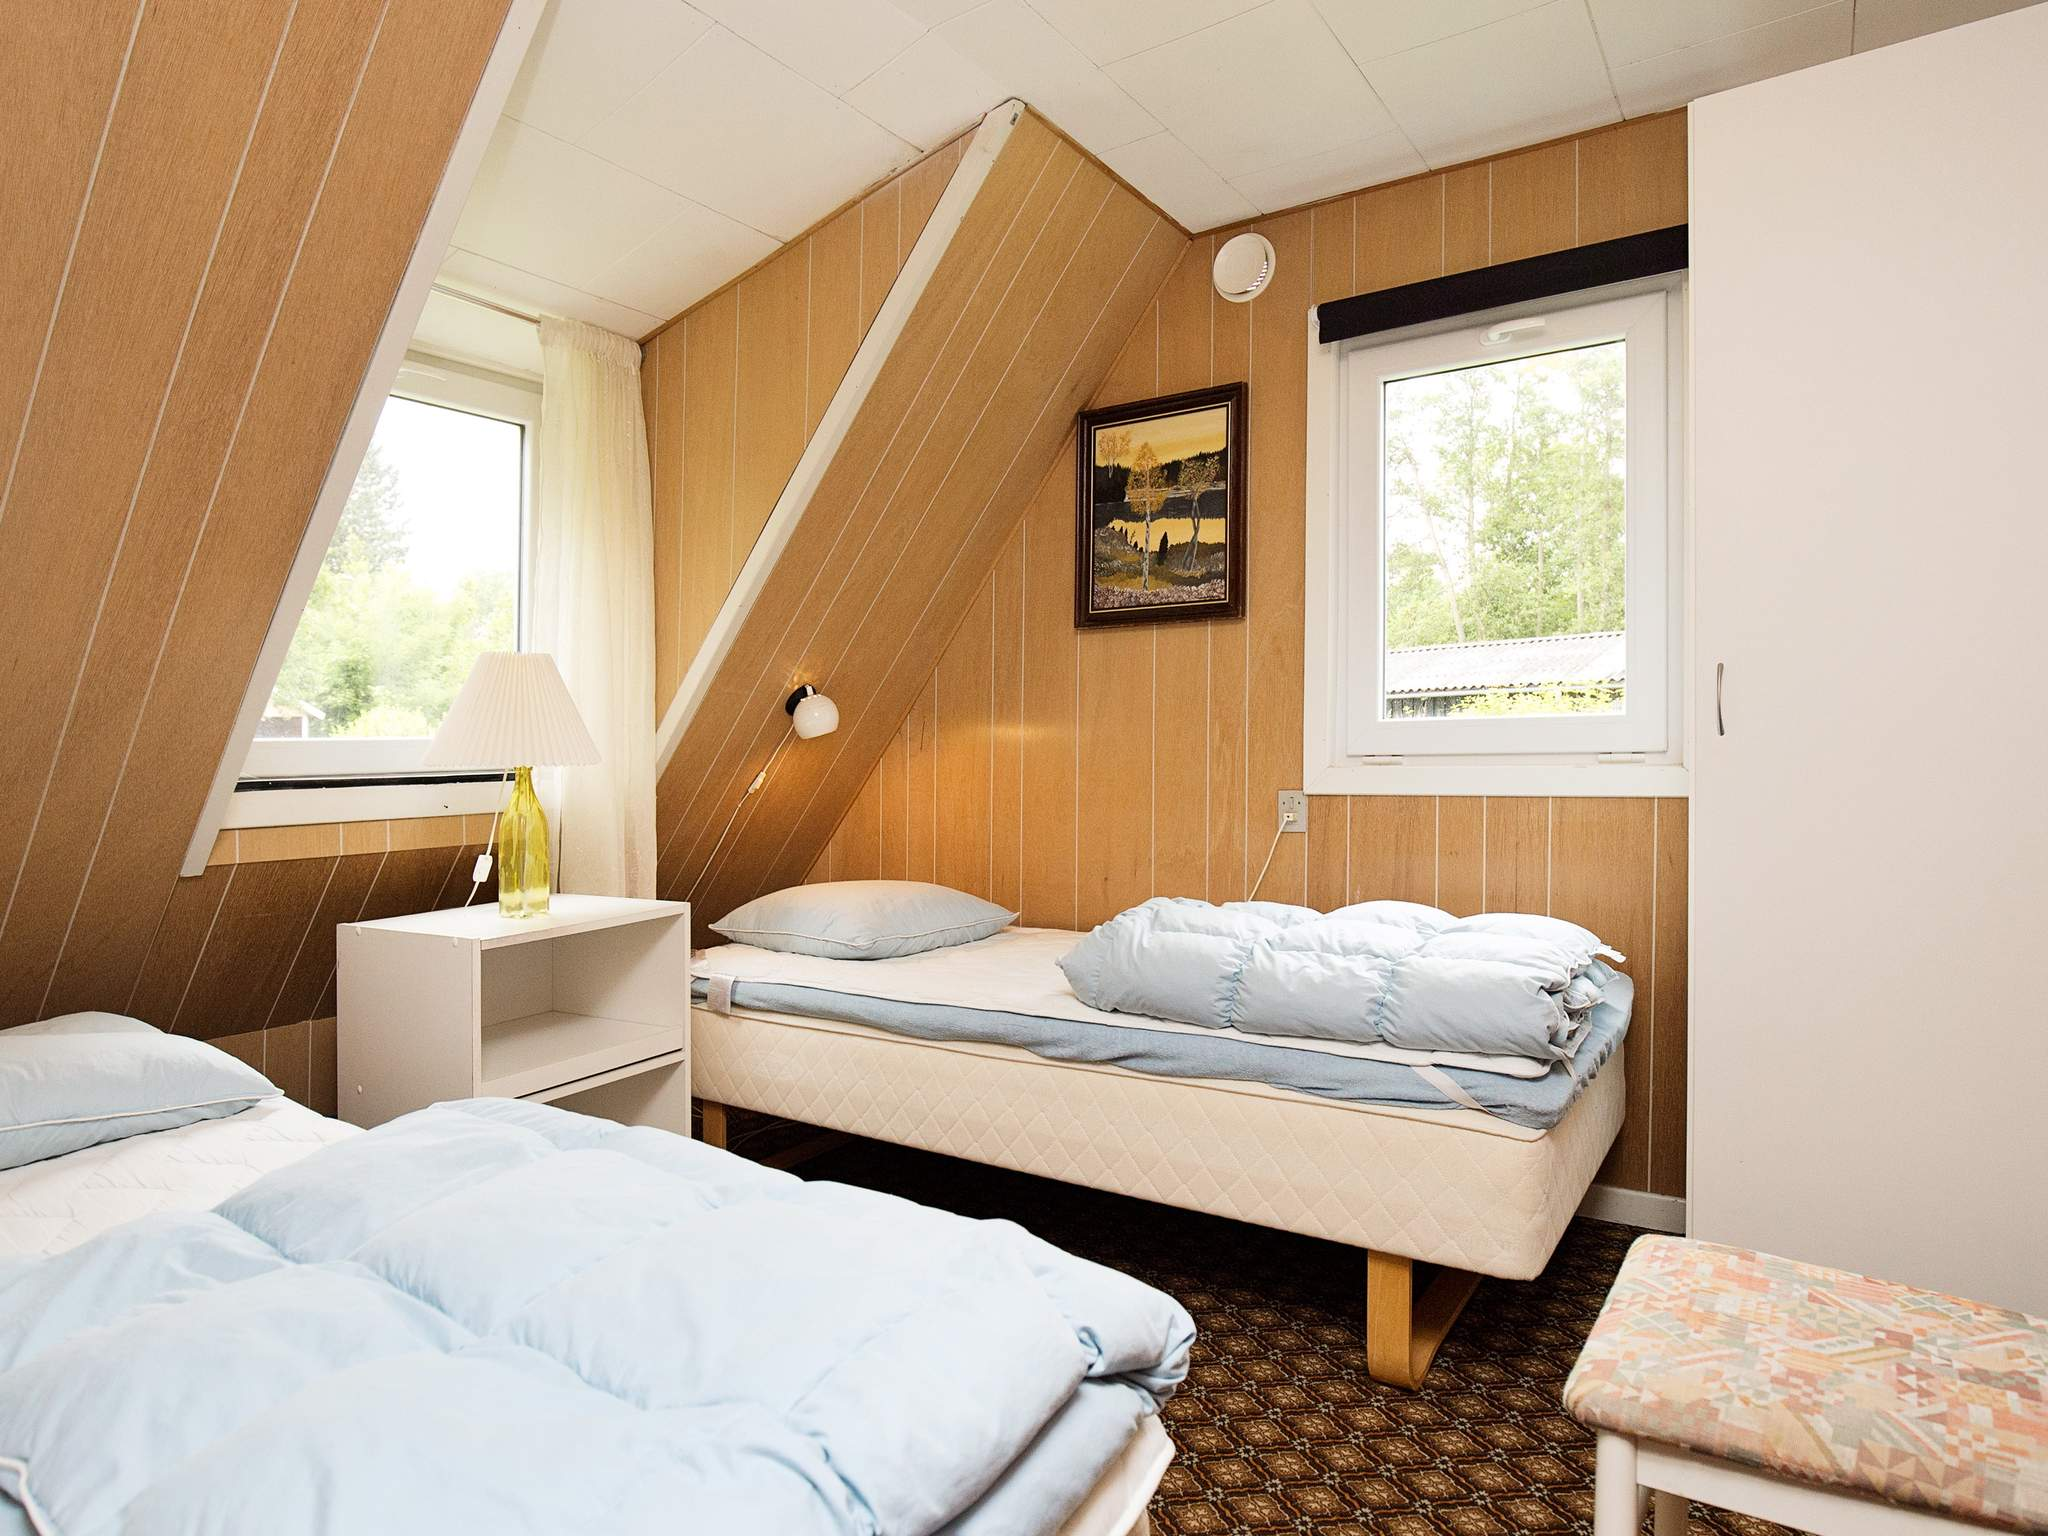 Ferienhaus Nyrup (87389), Nyrup, , Westseeland, Dänemark, Bild 9